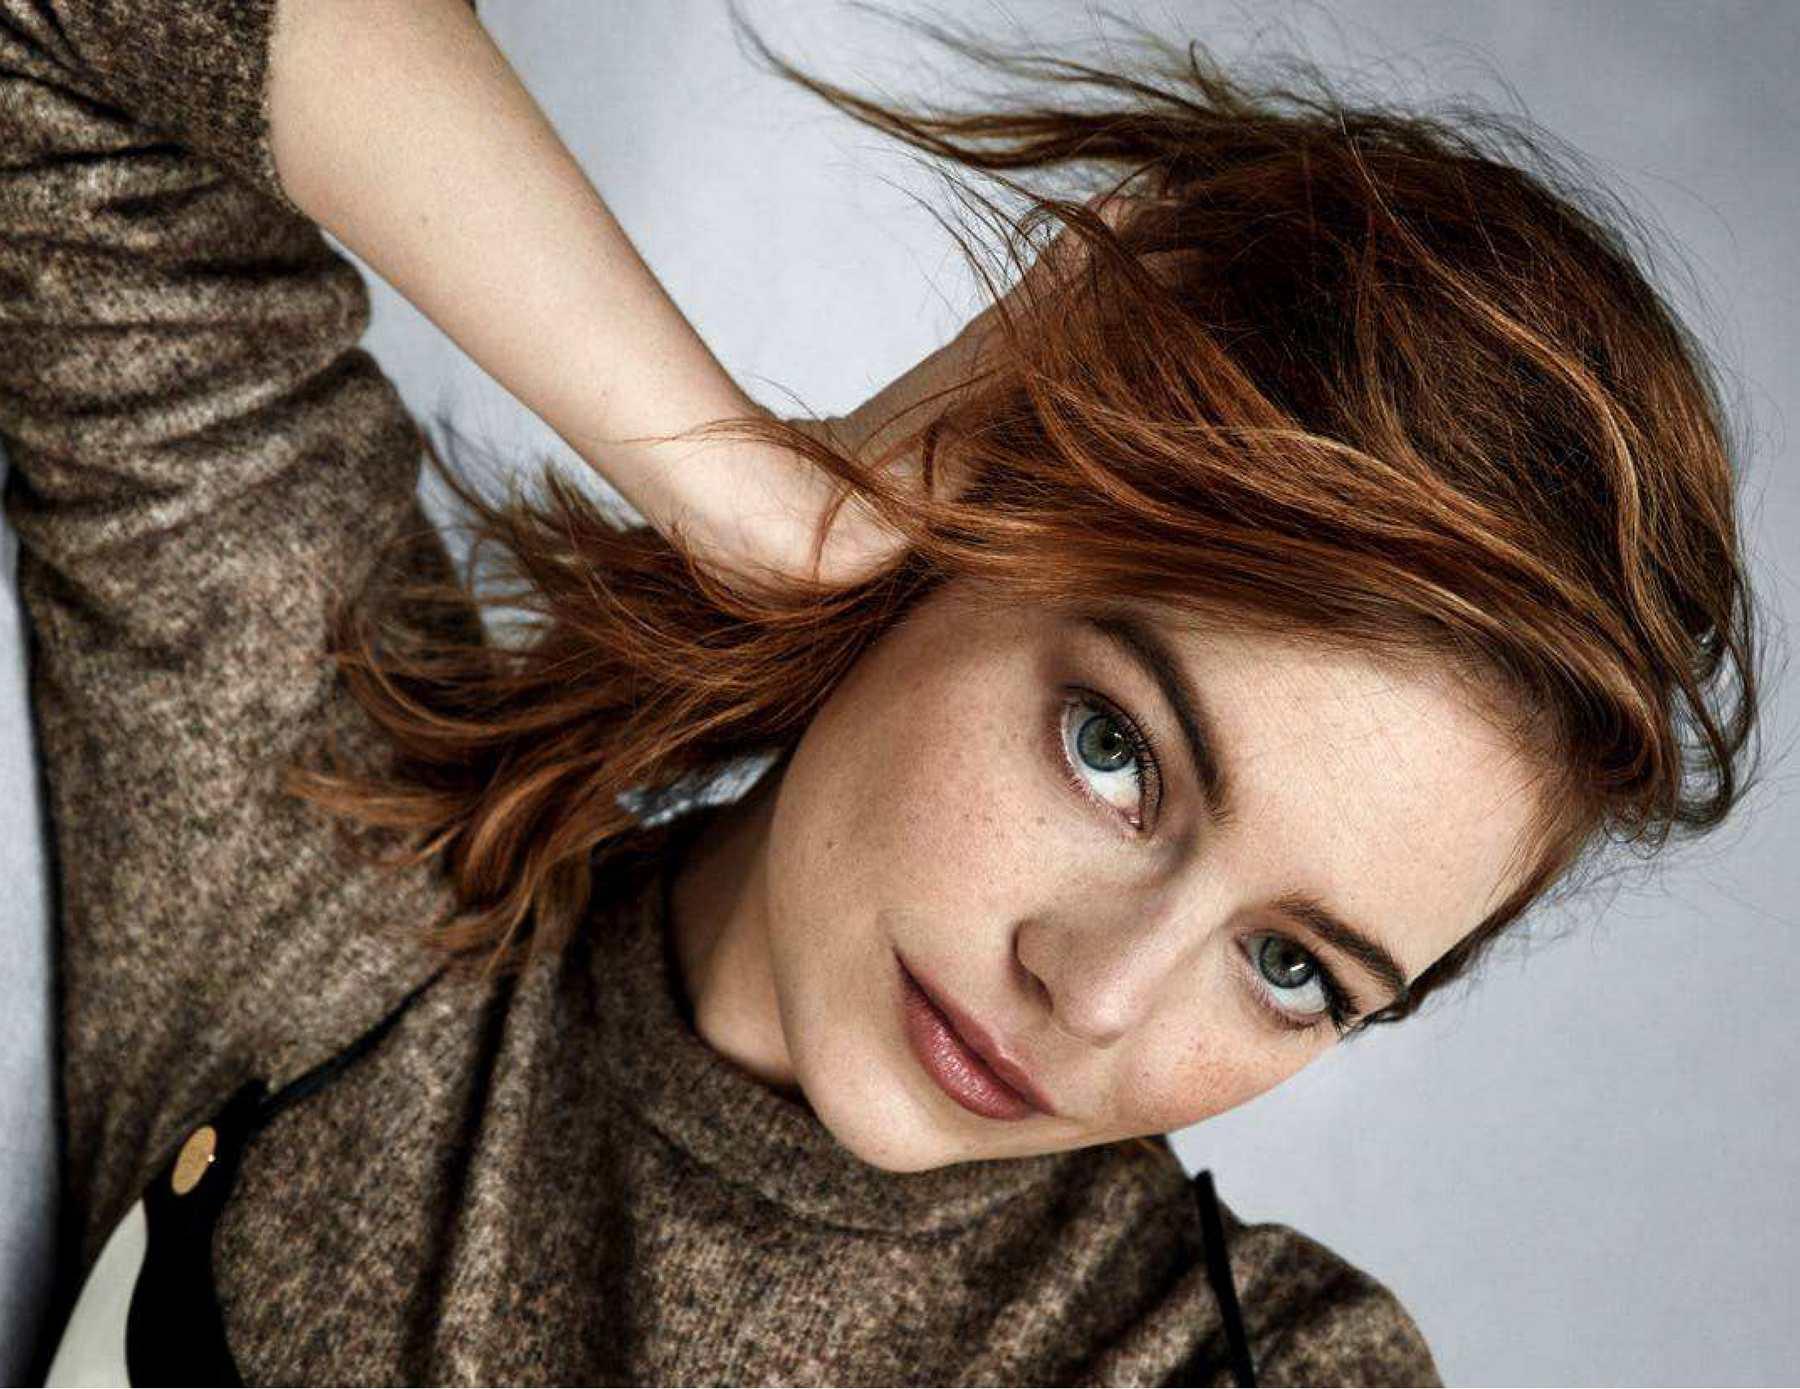 Emma-Stone-Madame-Figaro-14-September-201818ad0f973770384.jpg